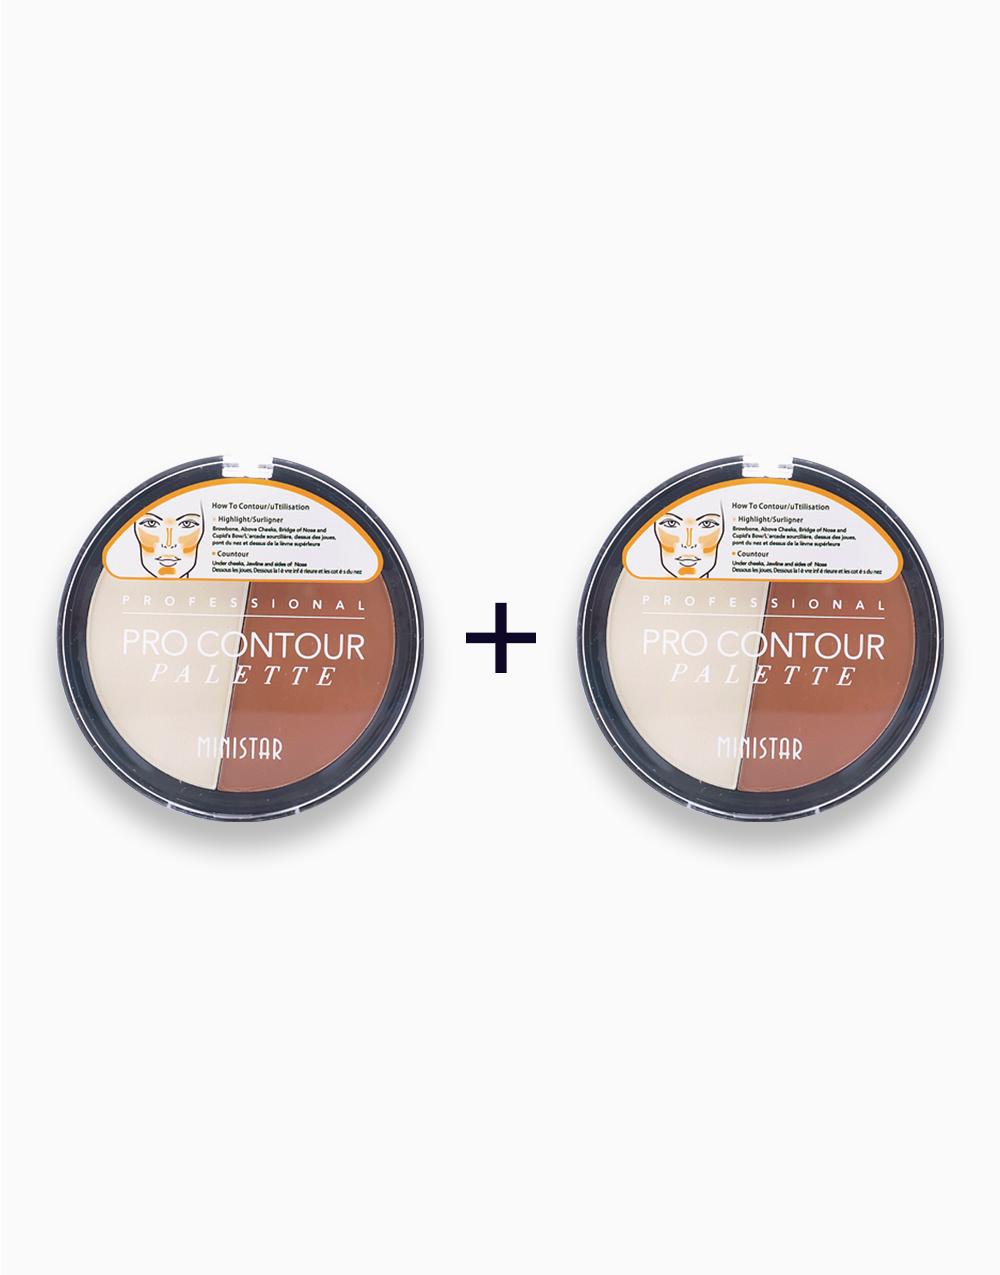 Pro Contour Palette (Buy 1, Take 1) by Ministar